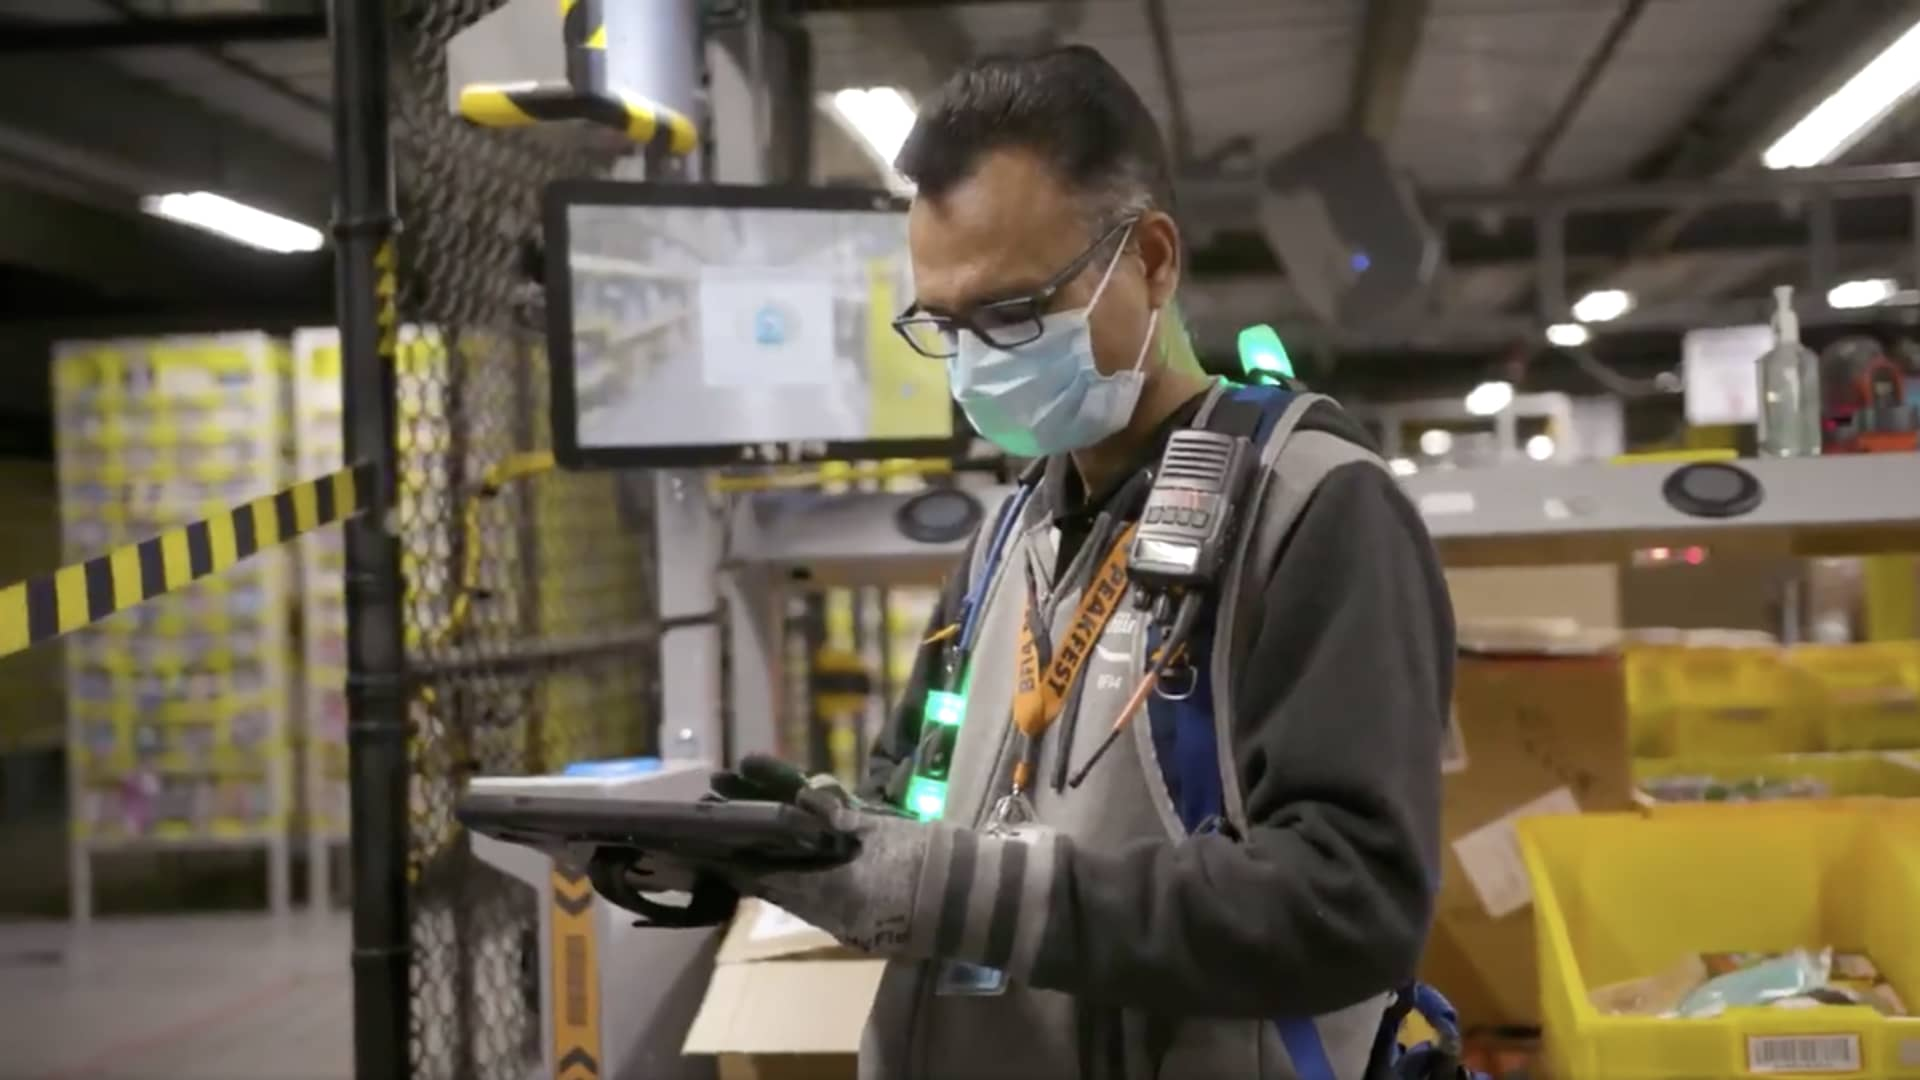 An Amazon worker inside a warehouse during coronavirus pandemic